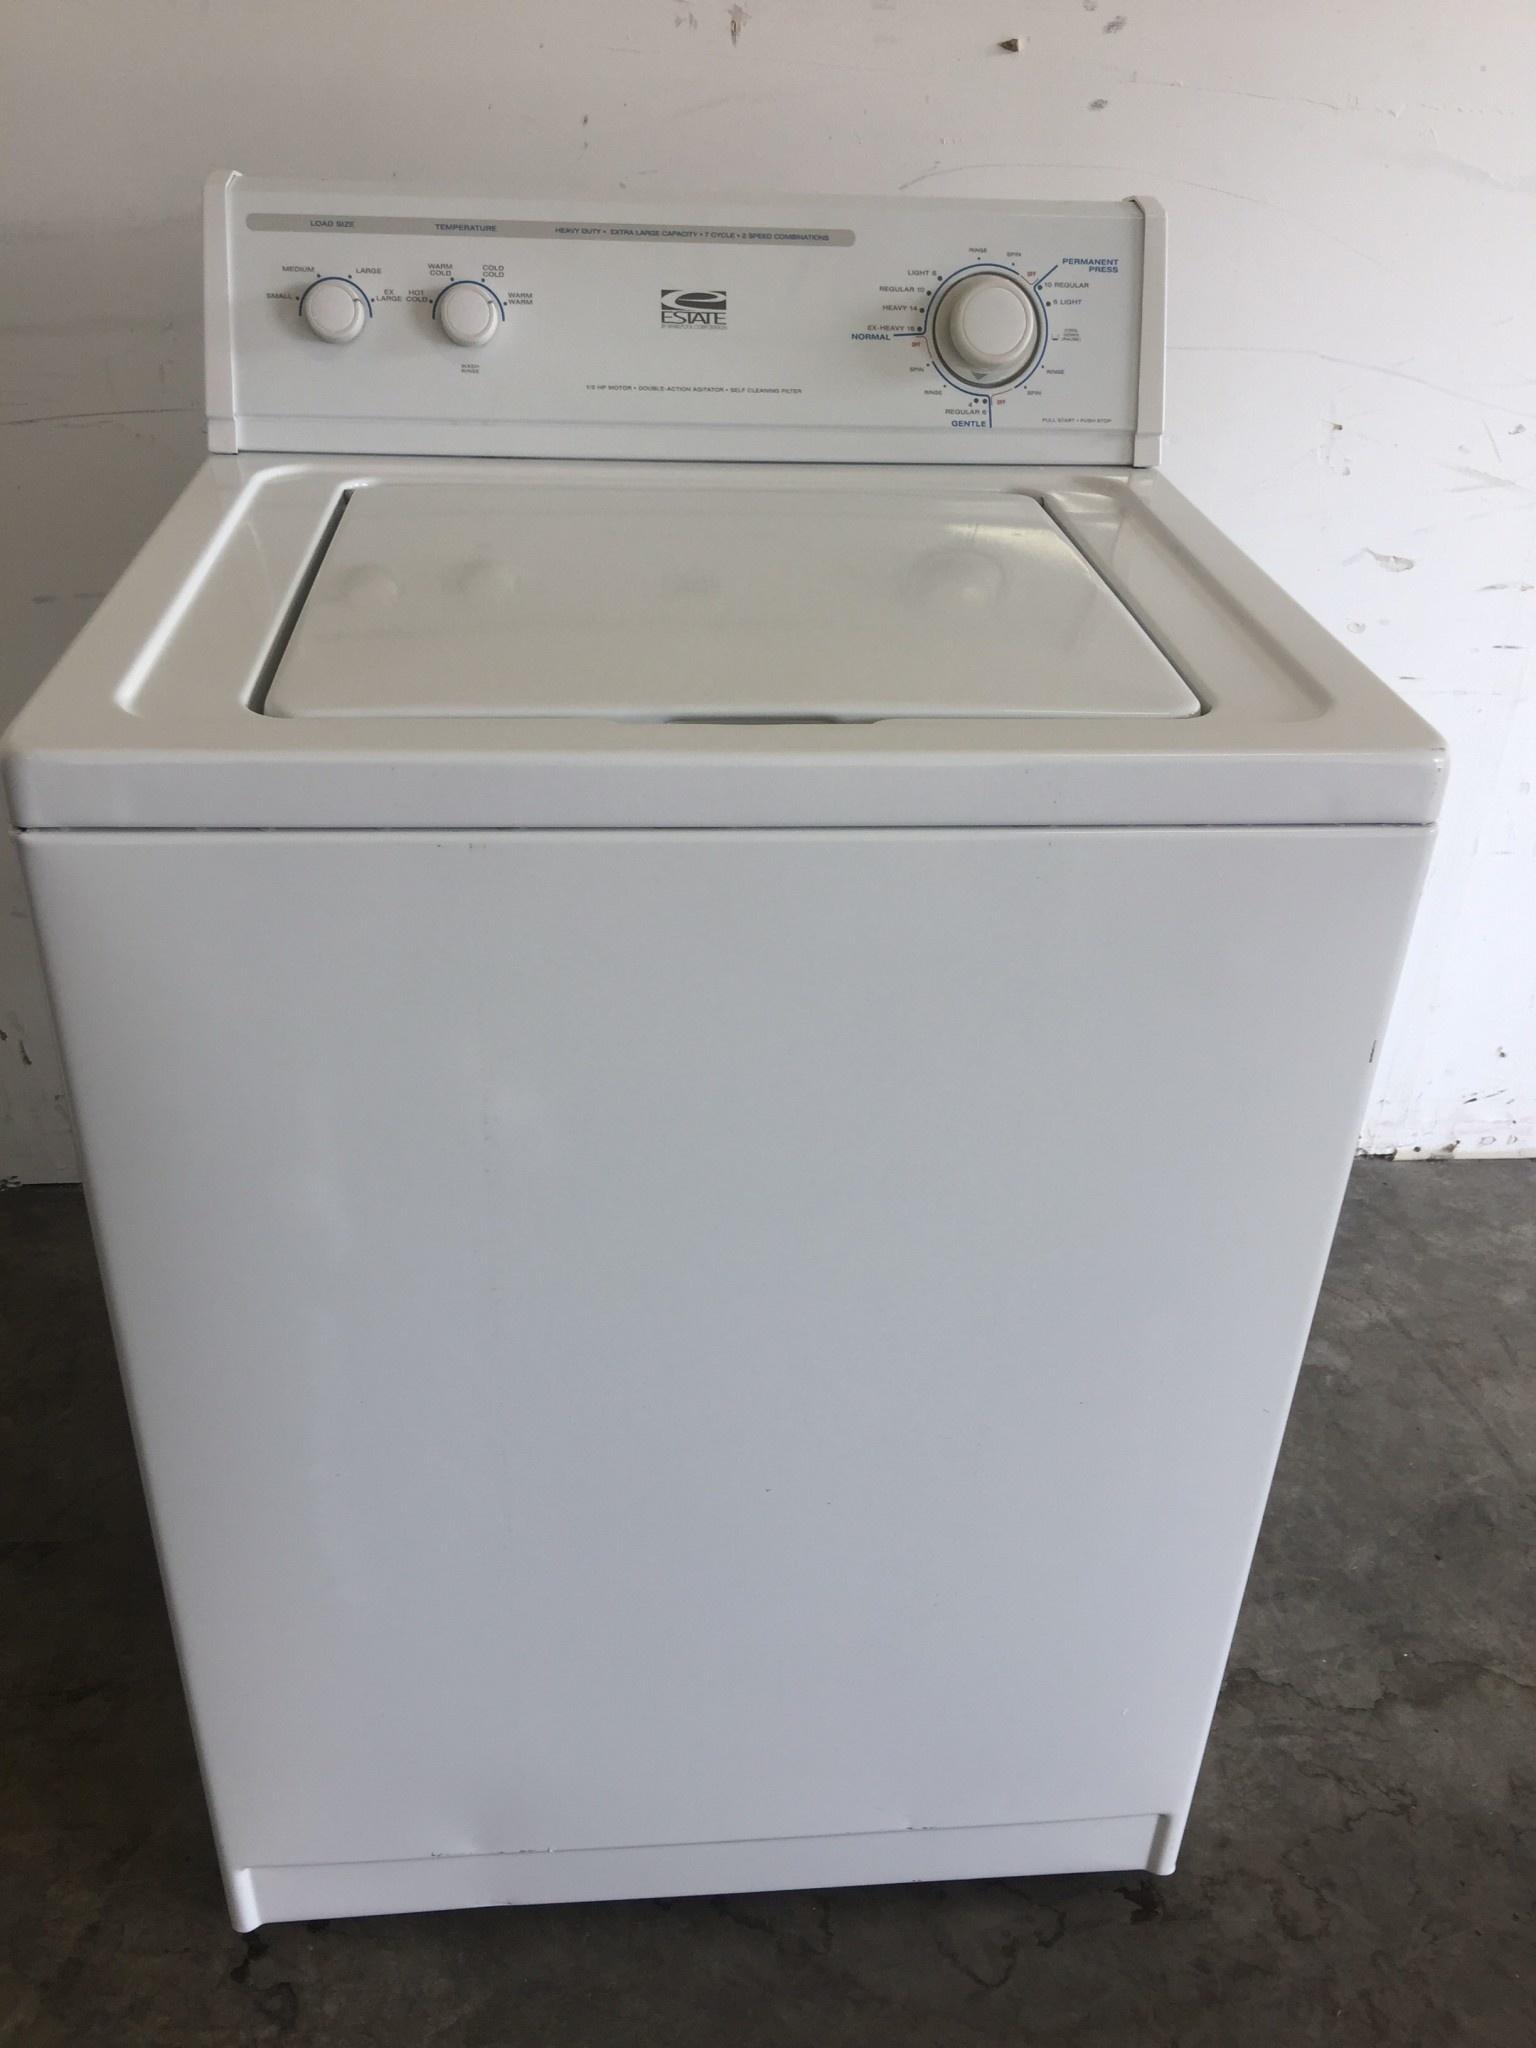 Estate Estate Top Load Washing Machine Discount City